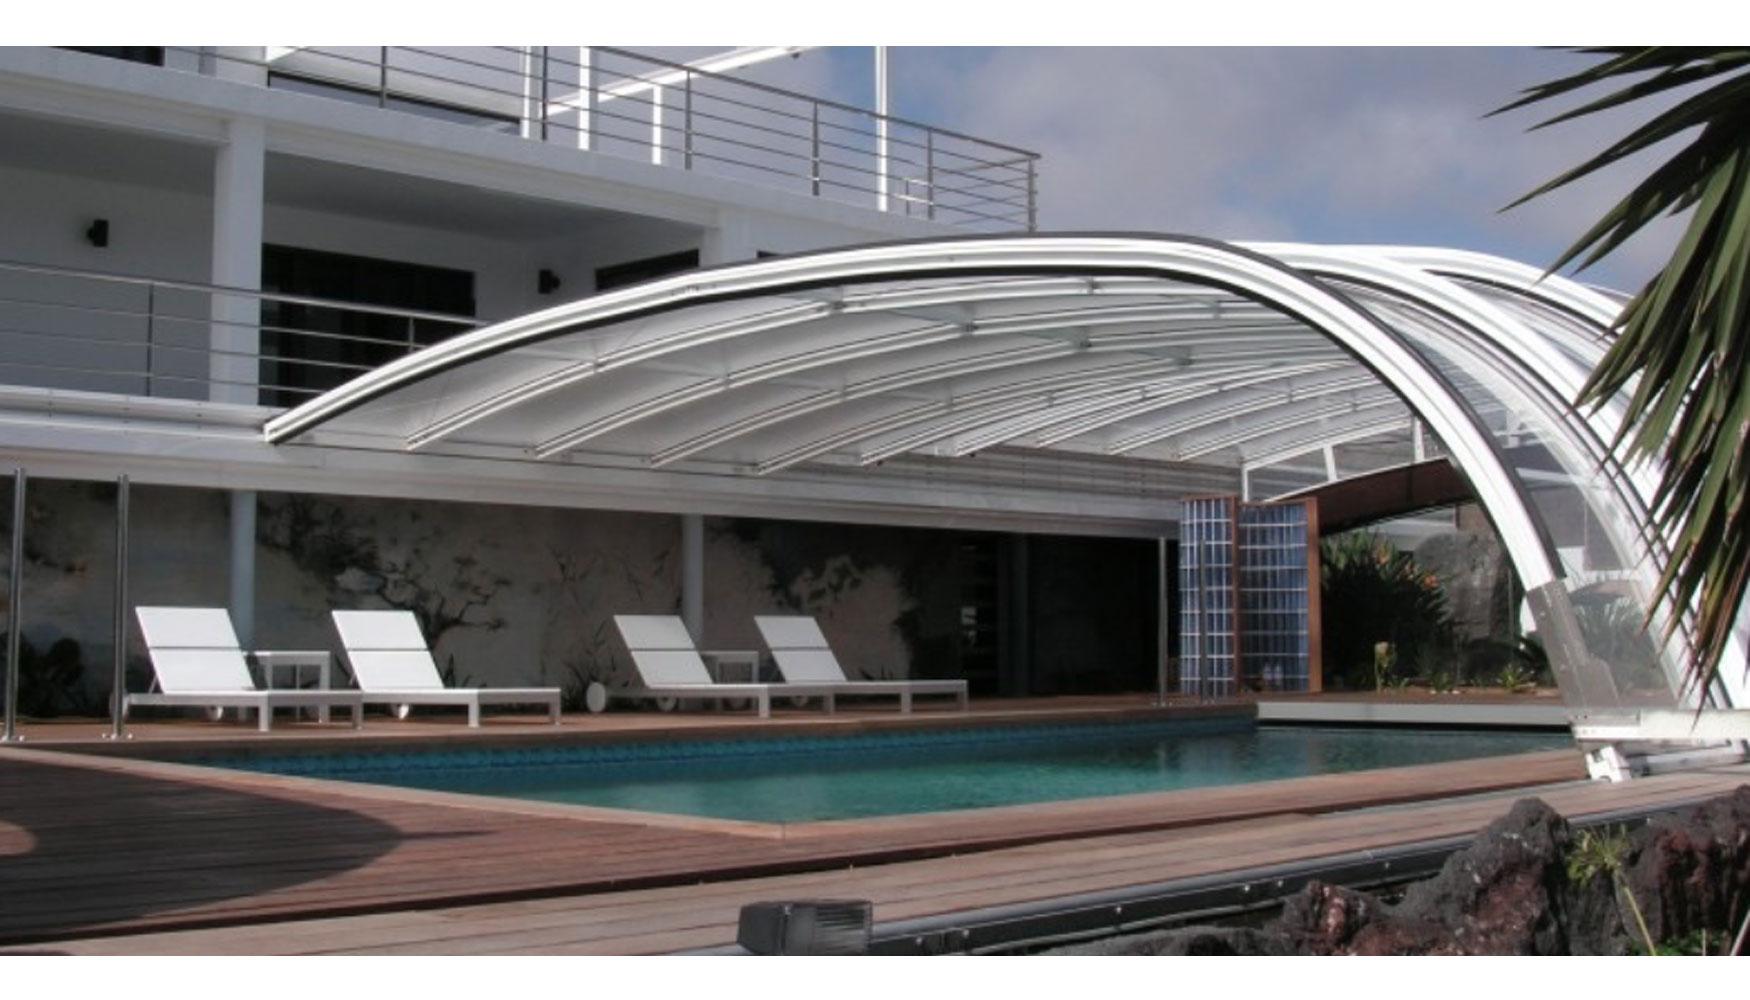 Cubiertas para piscinas de acmsa garant a de calidad y for Cubiertas para piscinas